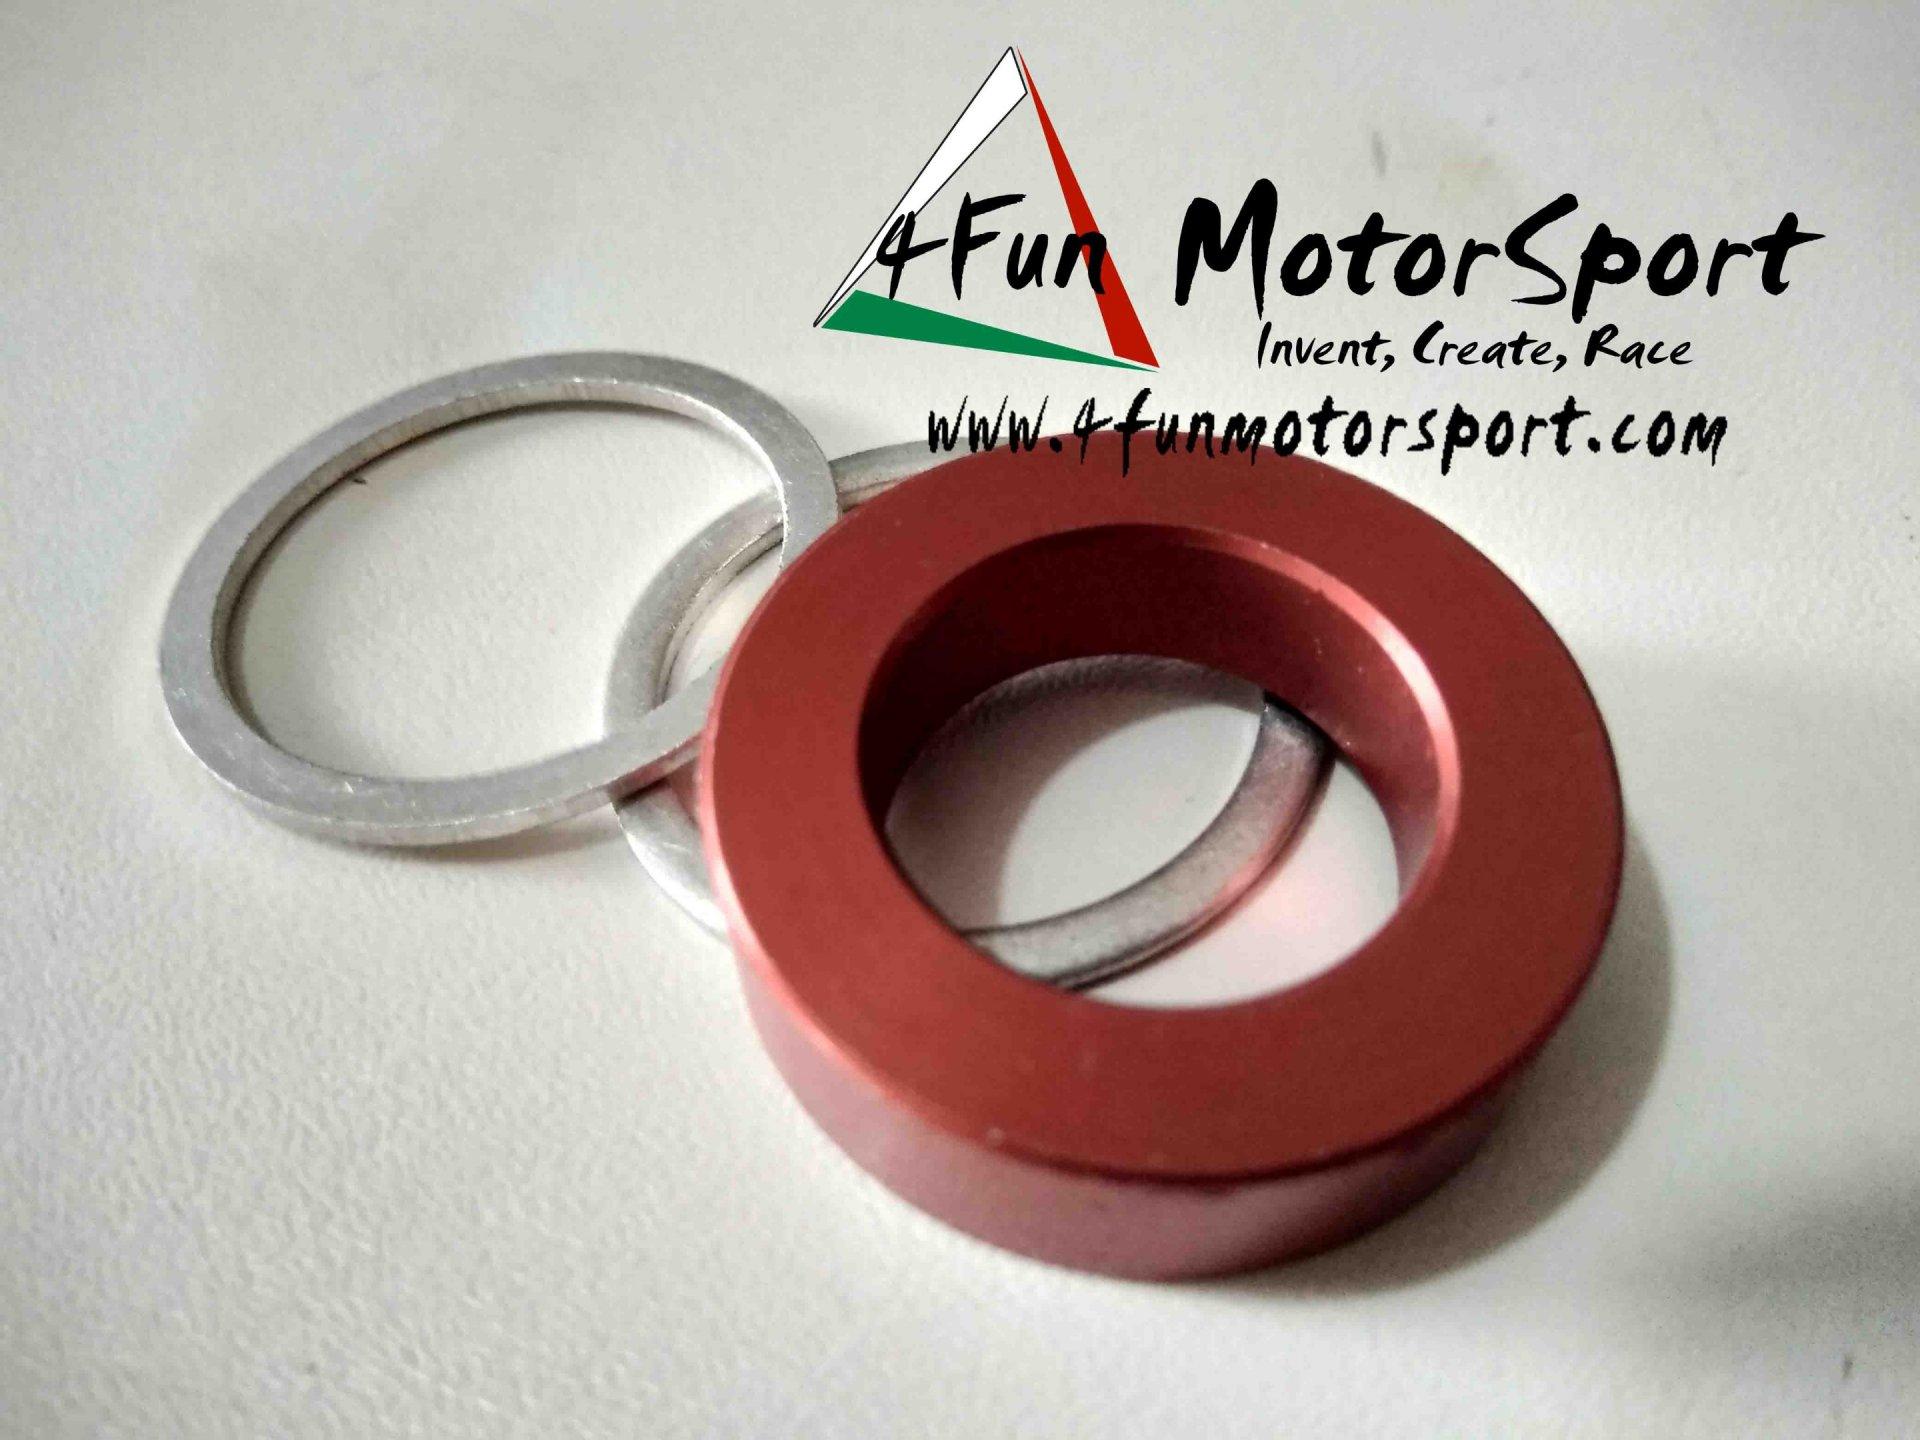 4fun Motorsport      Invent  Create  Race